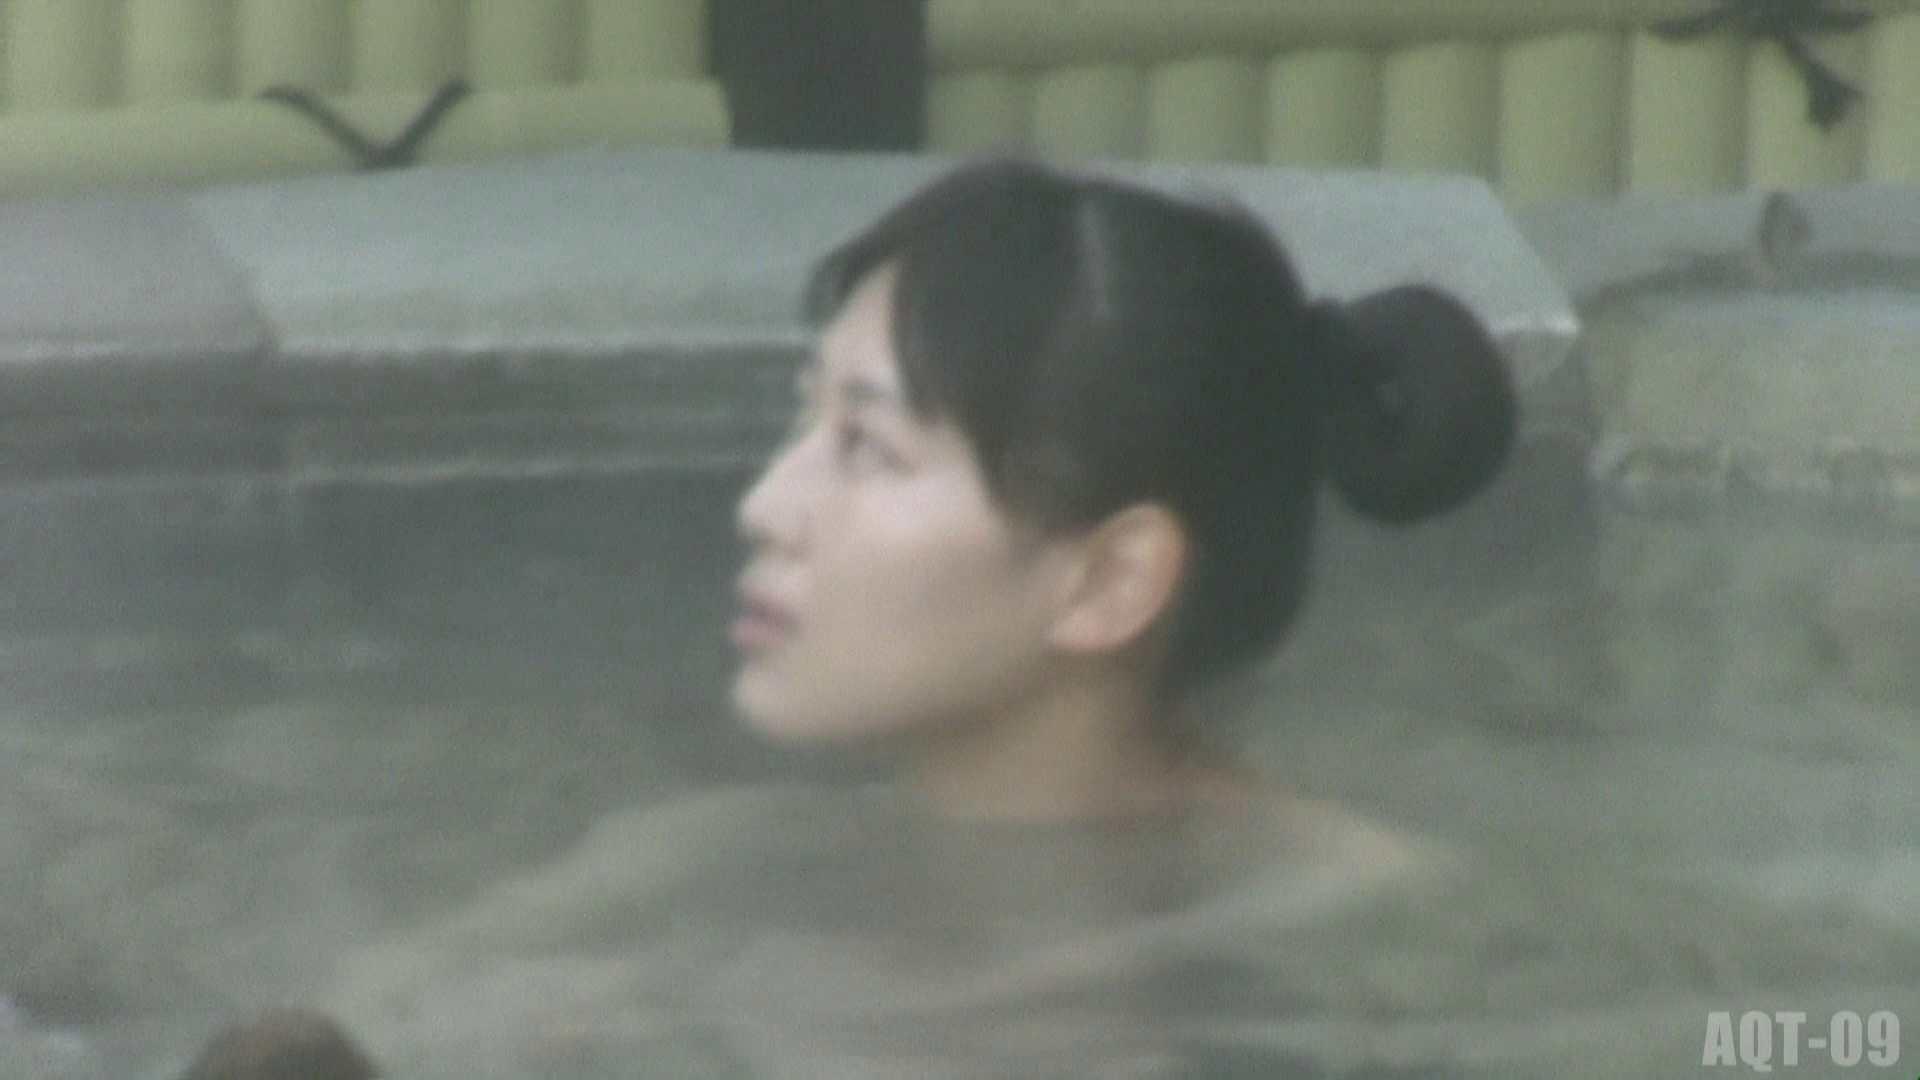 Aquaな露天風呂Vol.785 盗撮特撮 すけべAV動画紹介 12pic 2